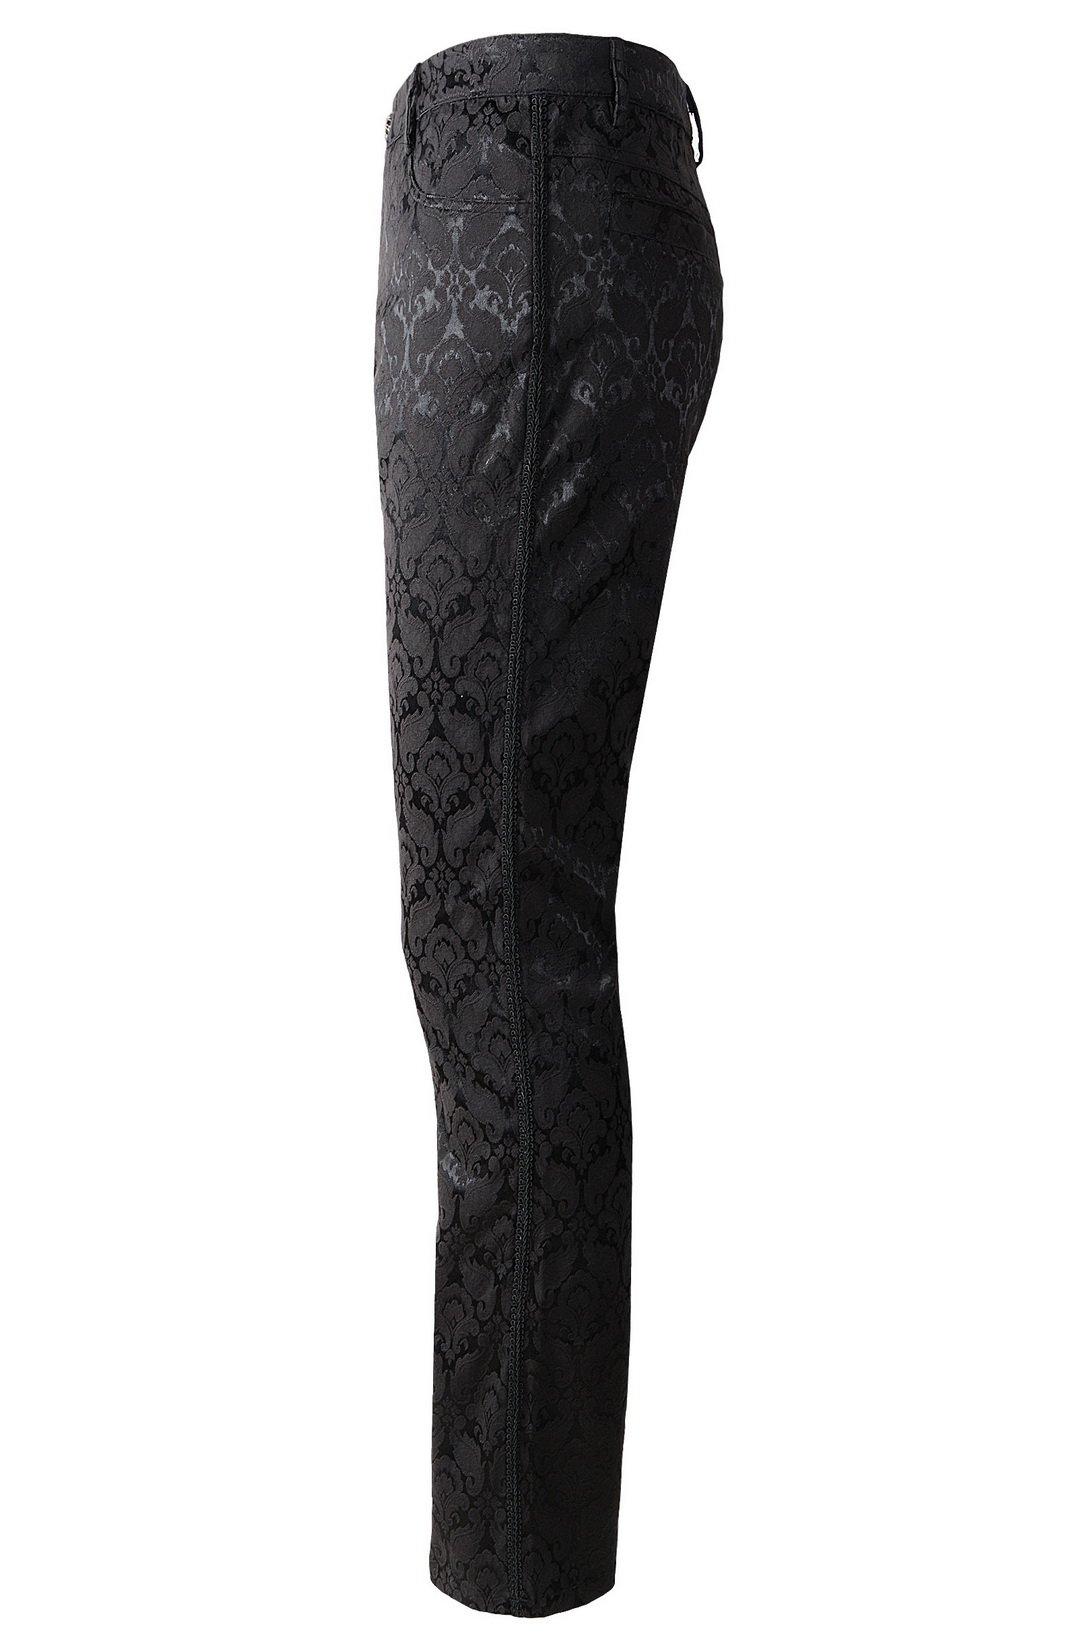 DarcChic Mens Trousers Pants Brocade VTG Gothic Aristocrat Steampunk Side Braiding Trim 4